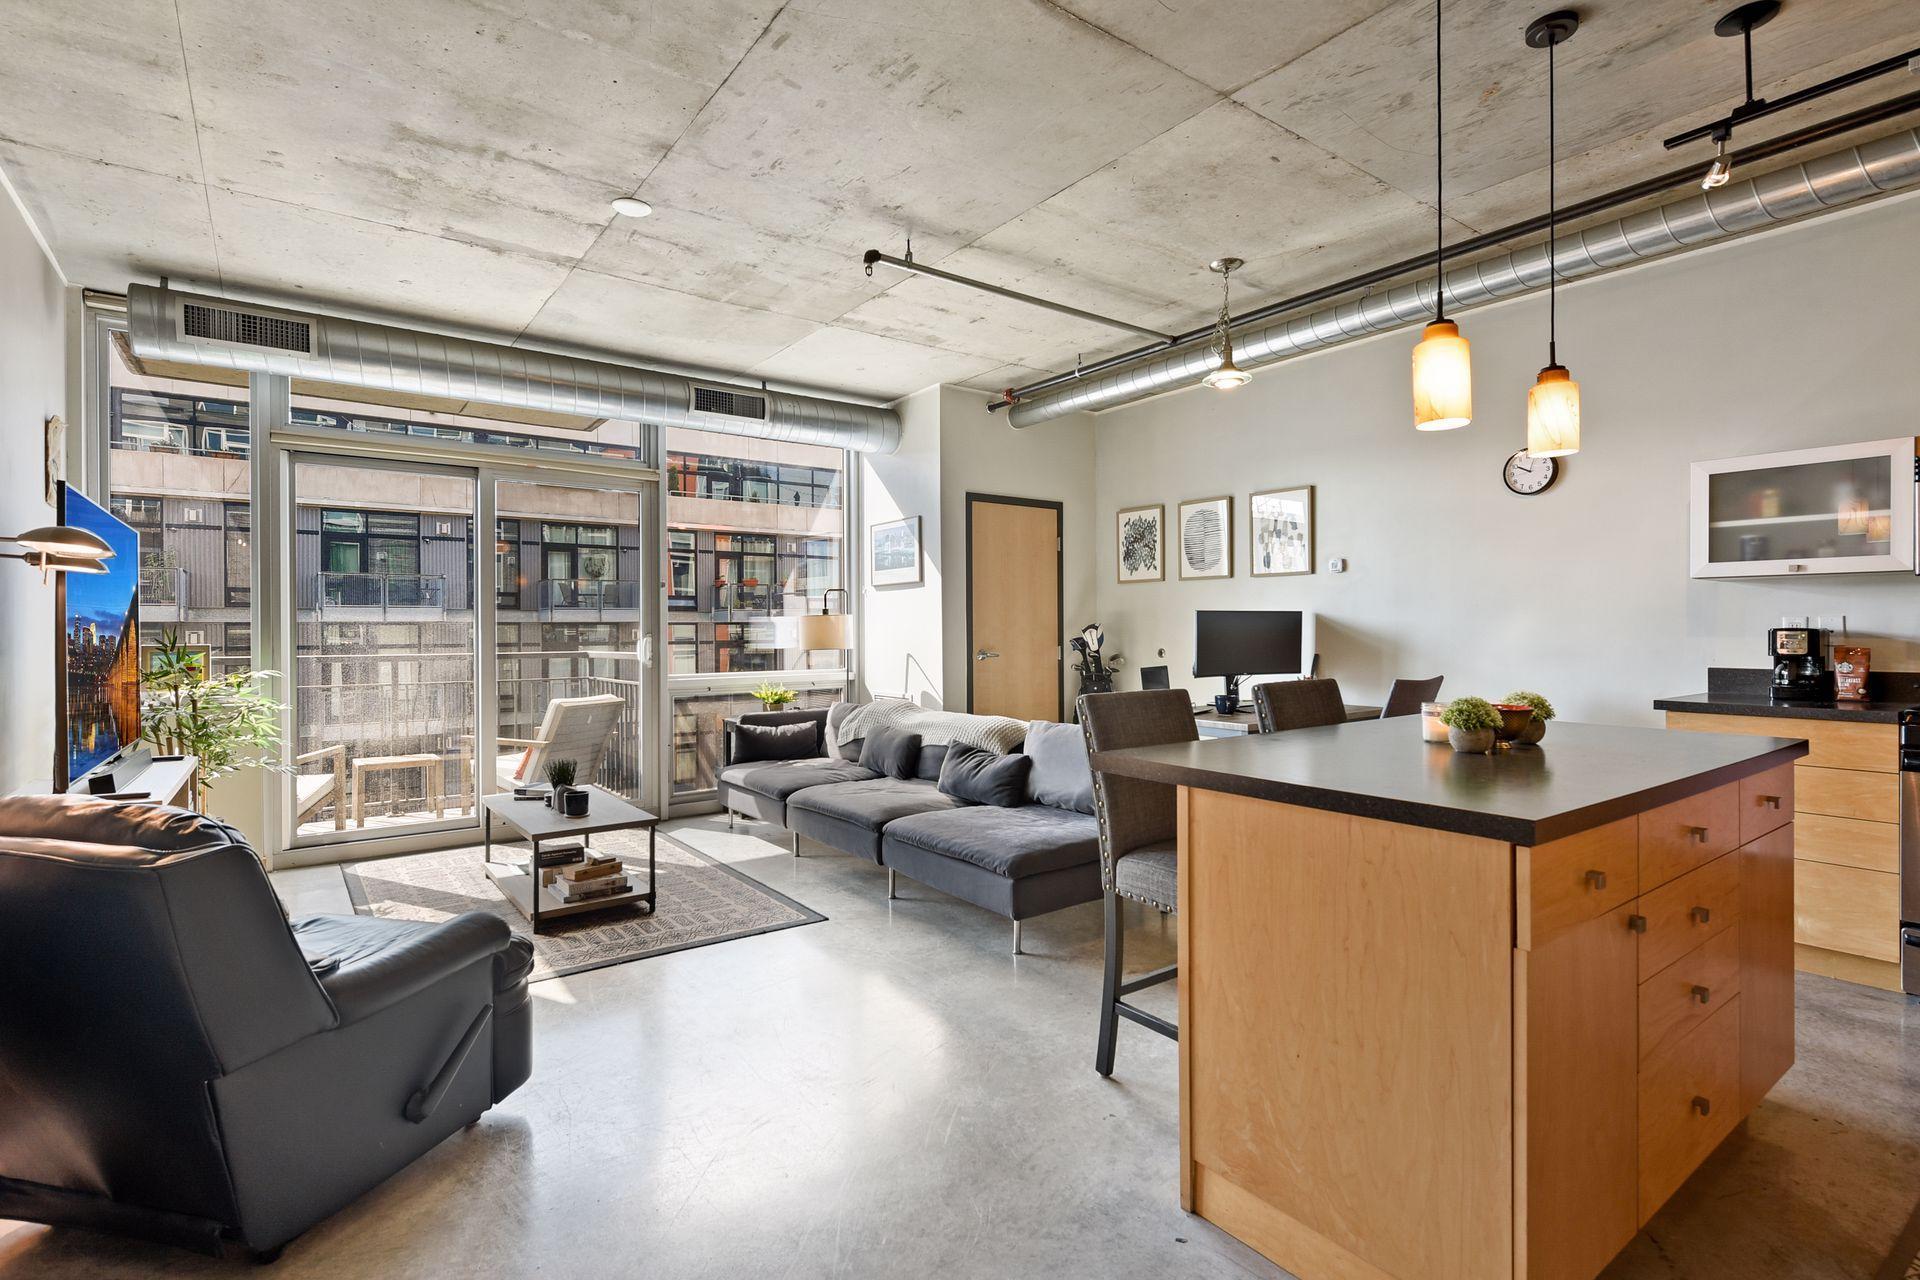 730 N 4th Street #608 Property Photo - Minneapolis, MN real estate listing